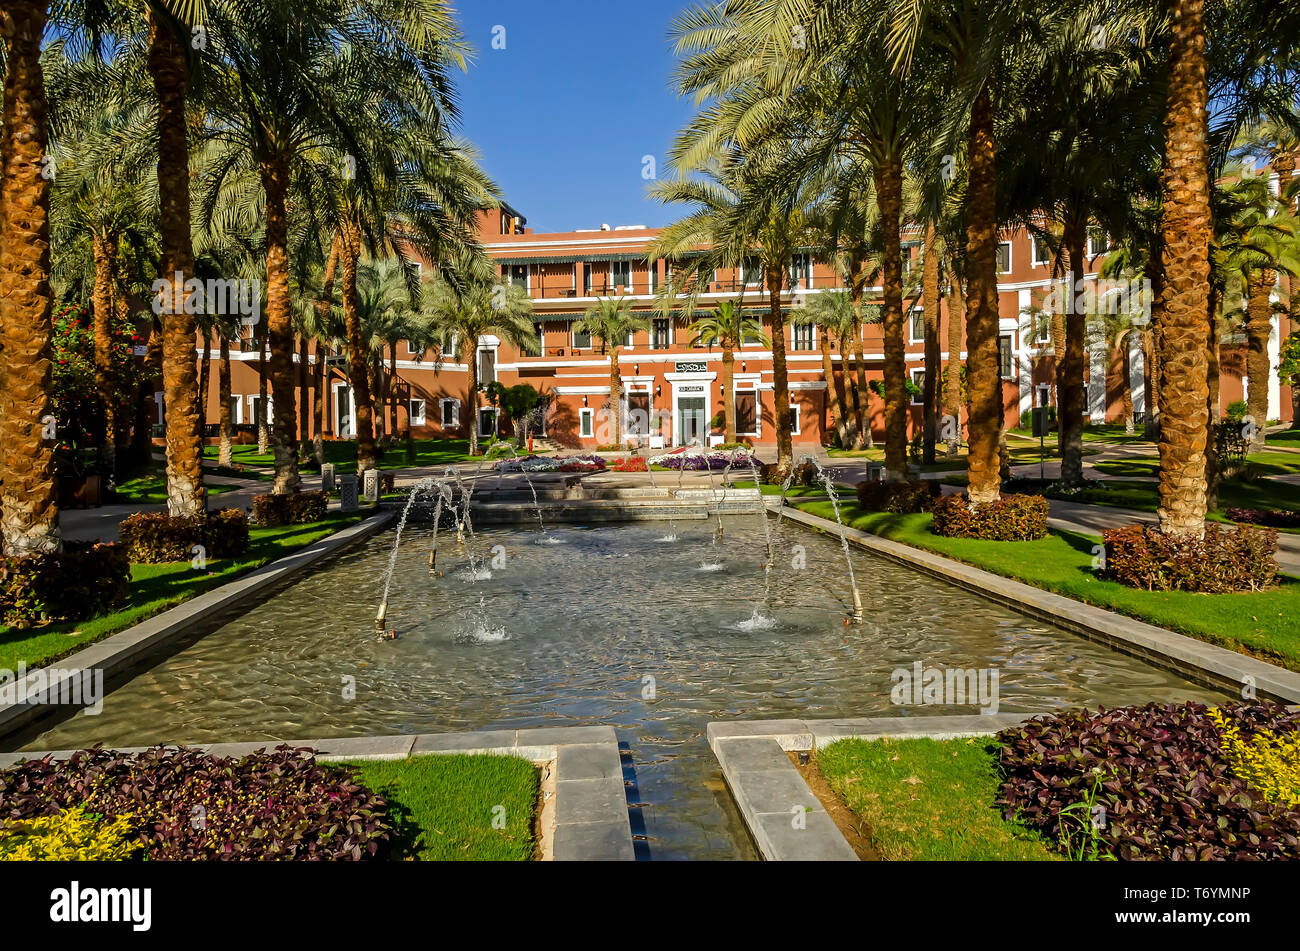 Sofitel Legend Old Cataract Hotel Main Entrance With Palm